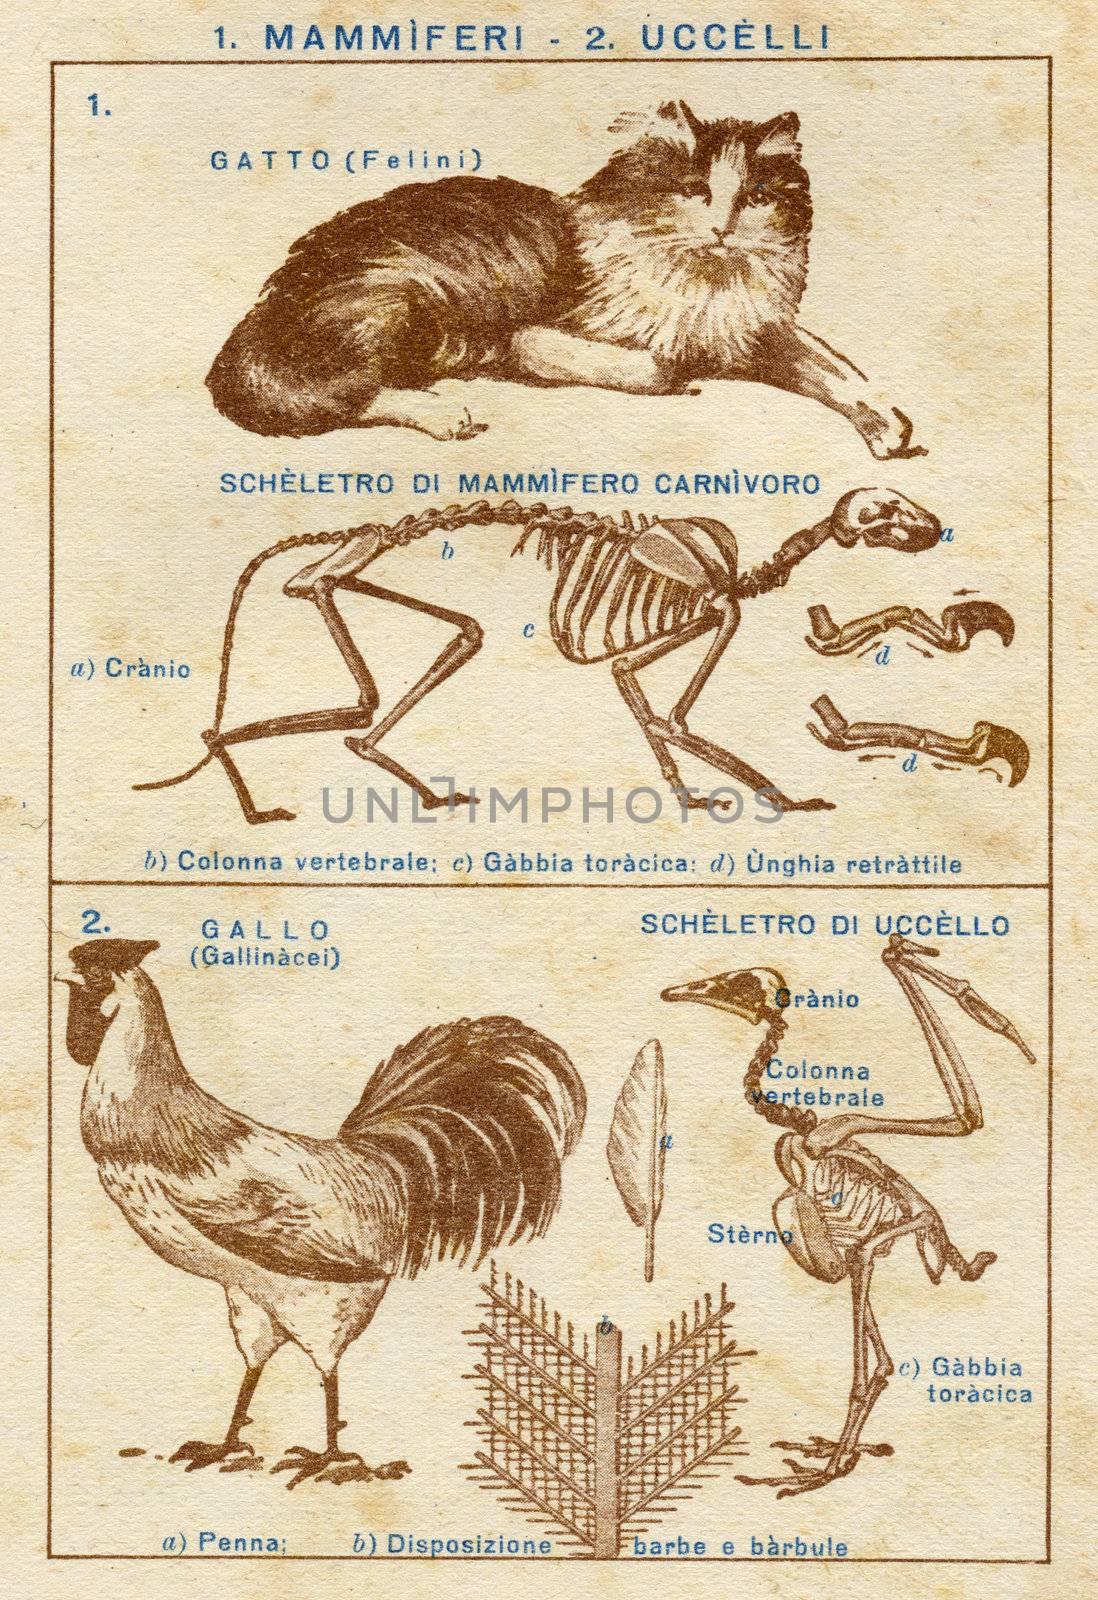 ITALY - CIRCA 1940: Vintage illustration of animals, circa 1940 in Italy